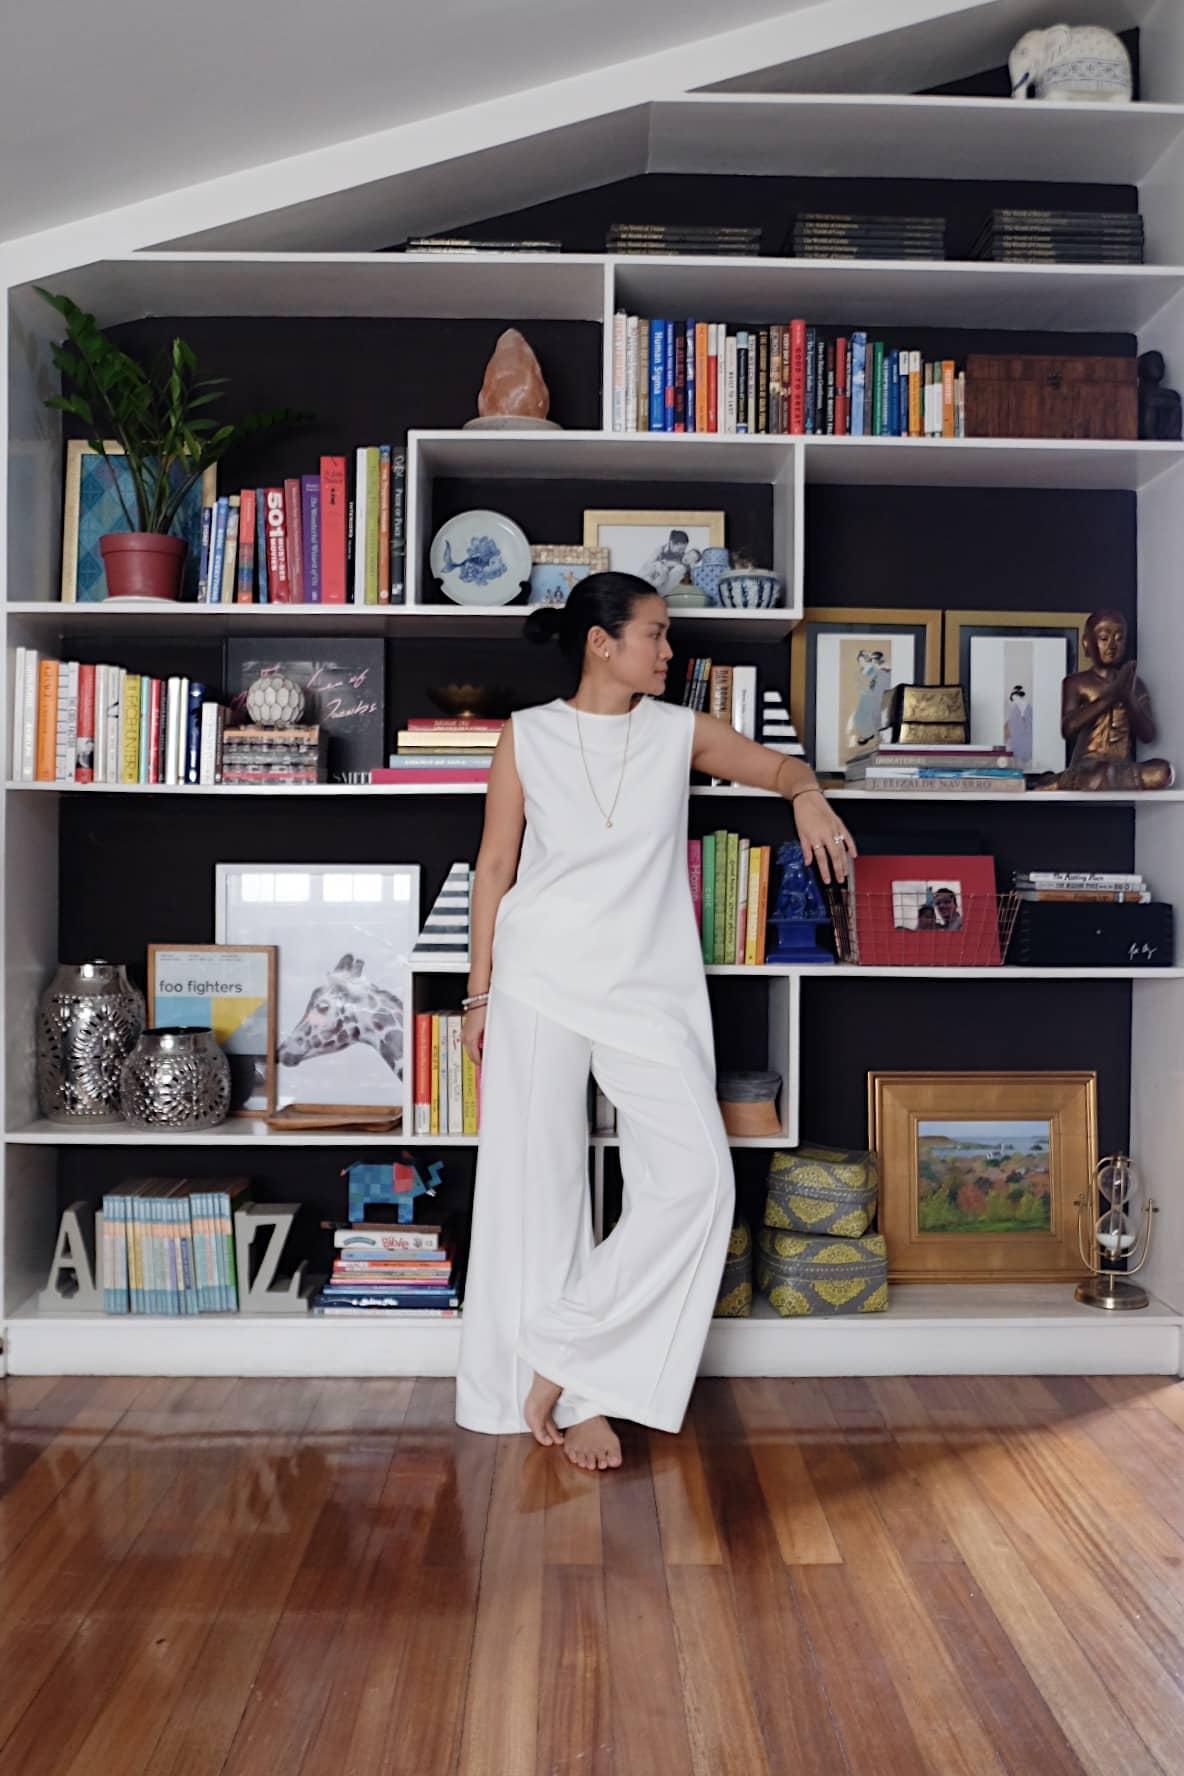 Shelf Styling by Leona Panutat